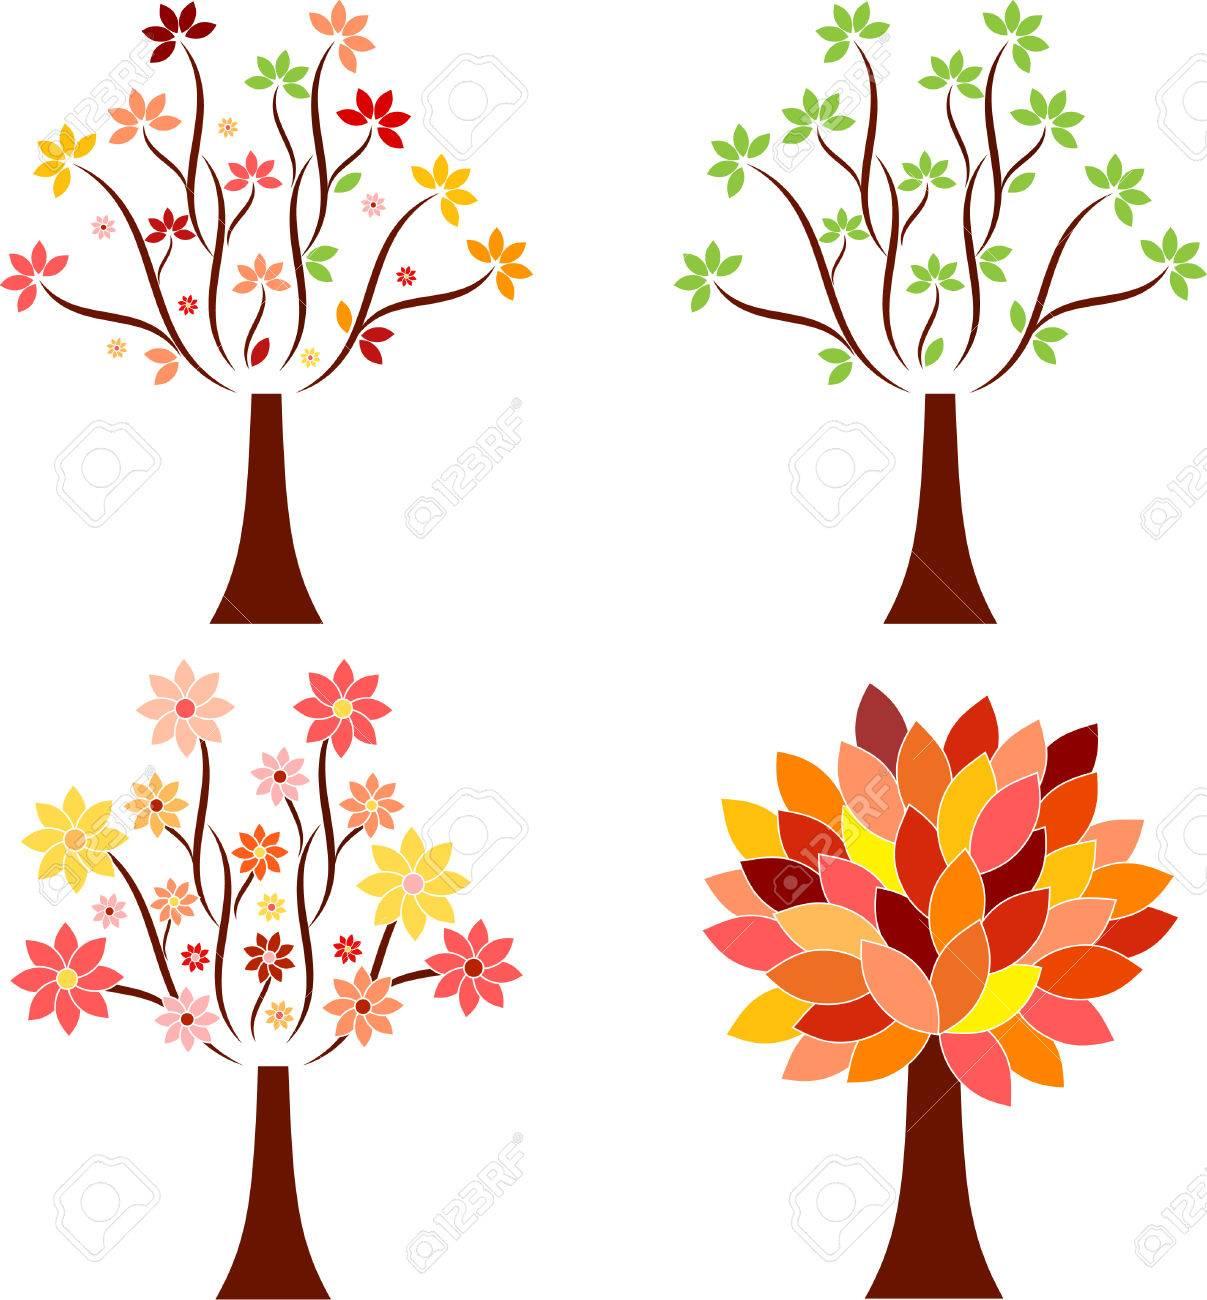 isolated seasonal tree vectors royalty free cliparts vectors and rh 123rf com tree vectors free three vectors are shown